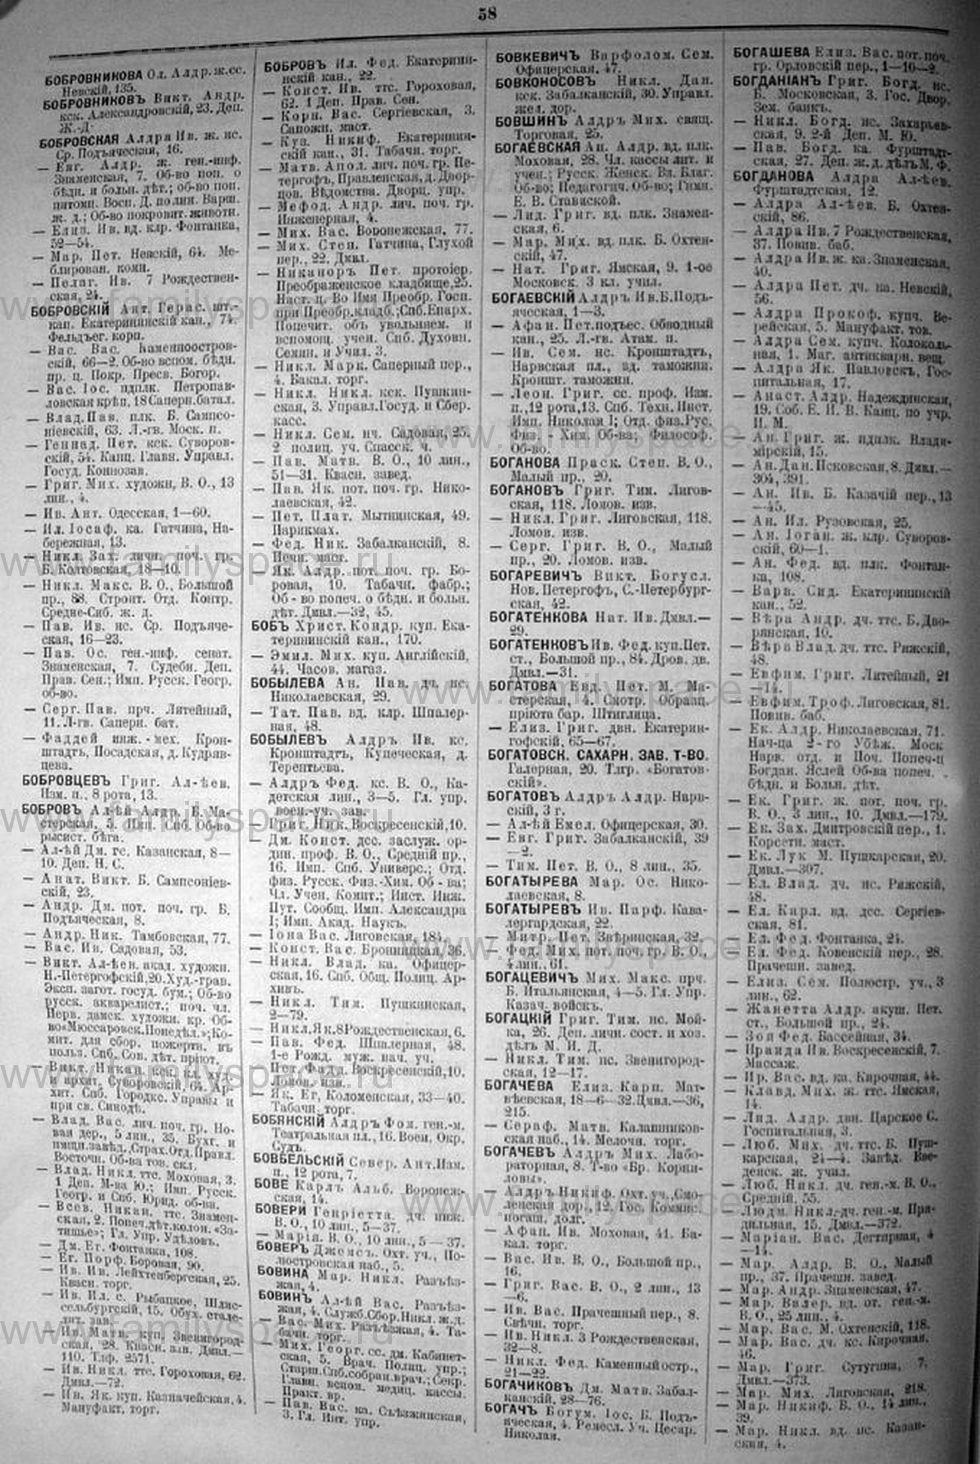 Поиск по фамилии - Санкт-Петербург - 1901, страница 58